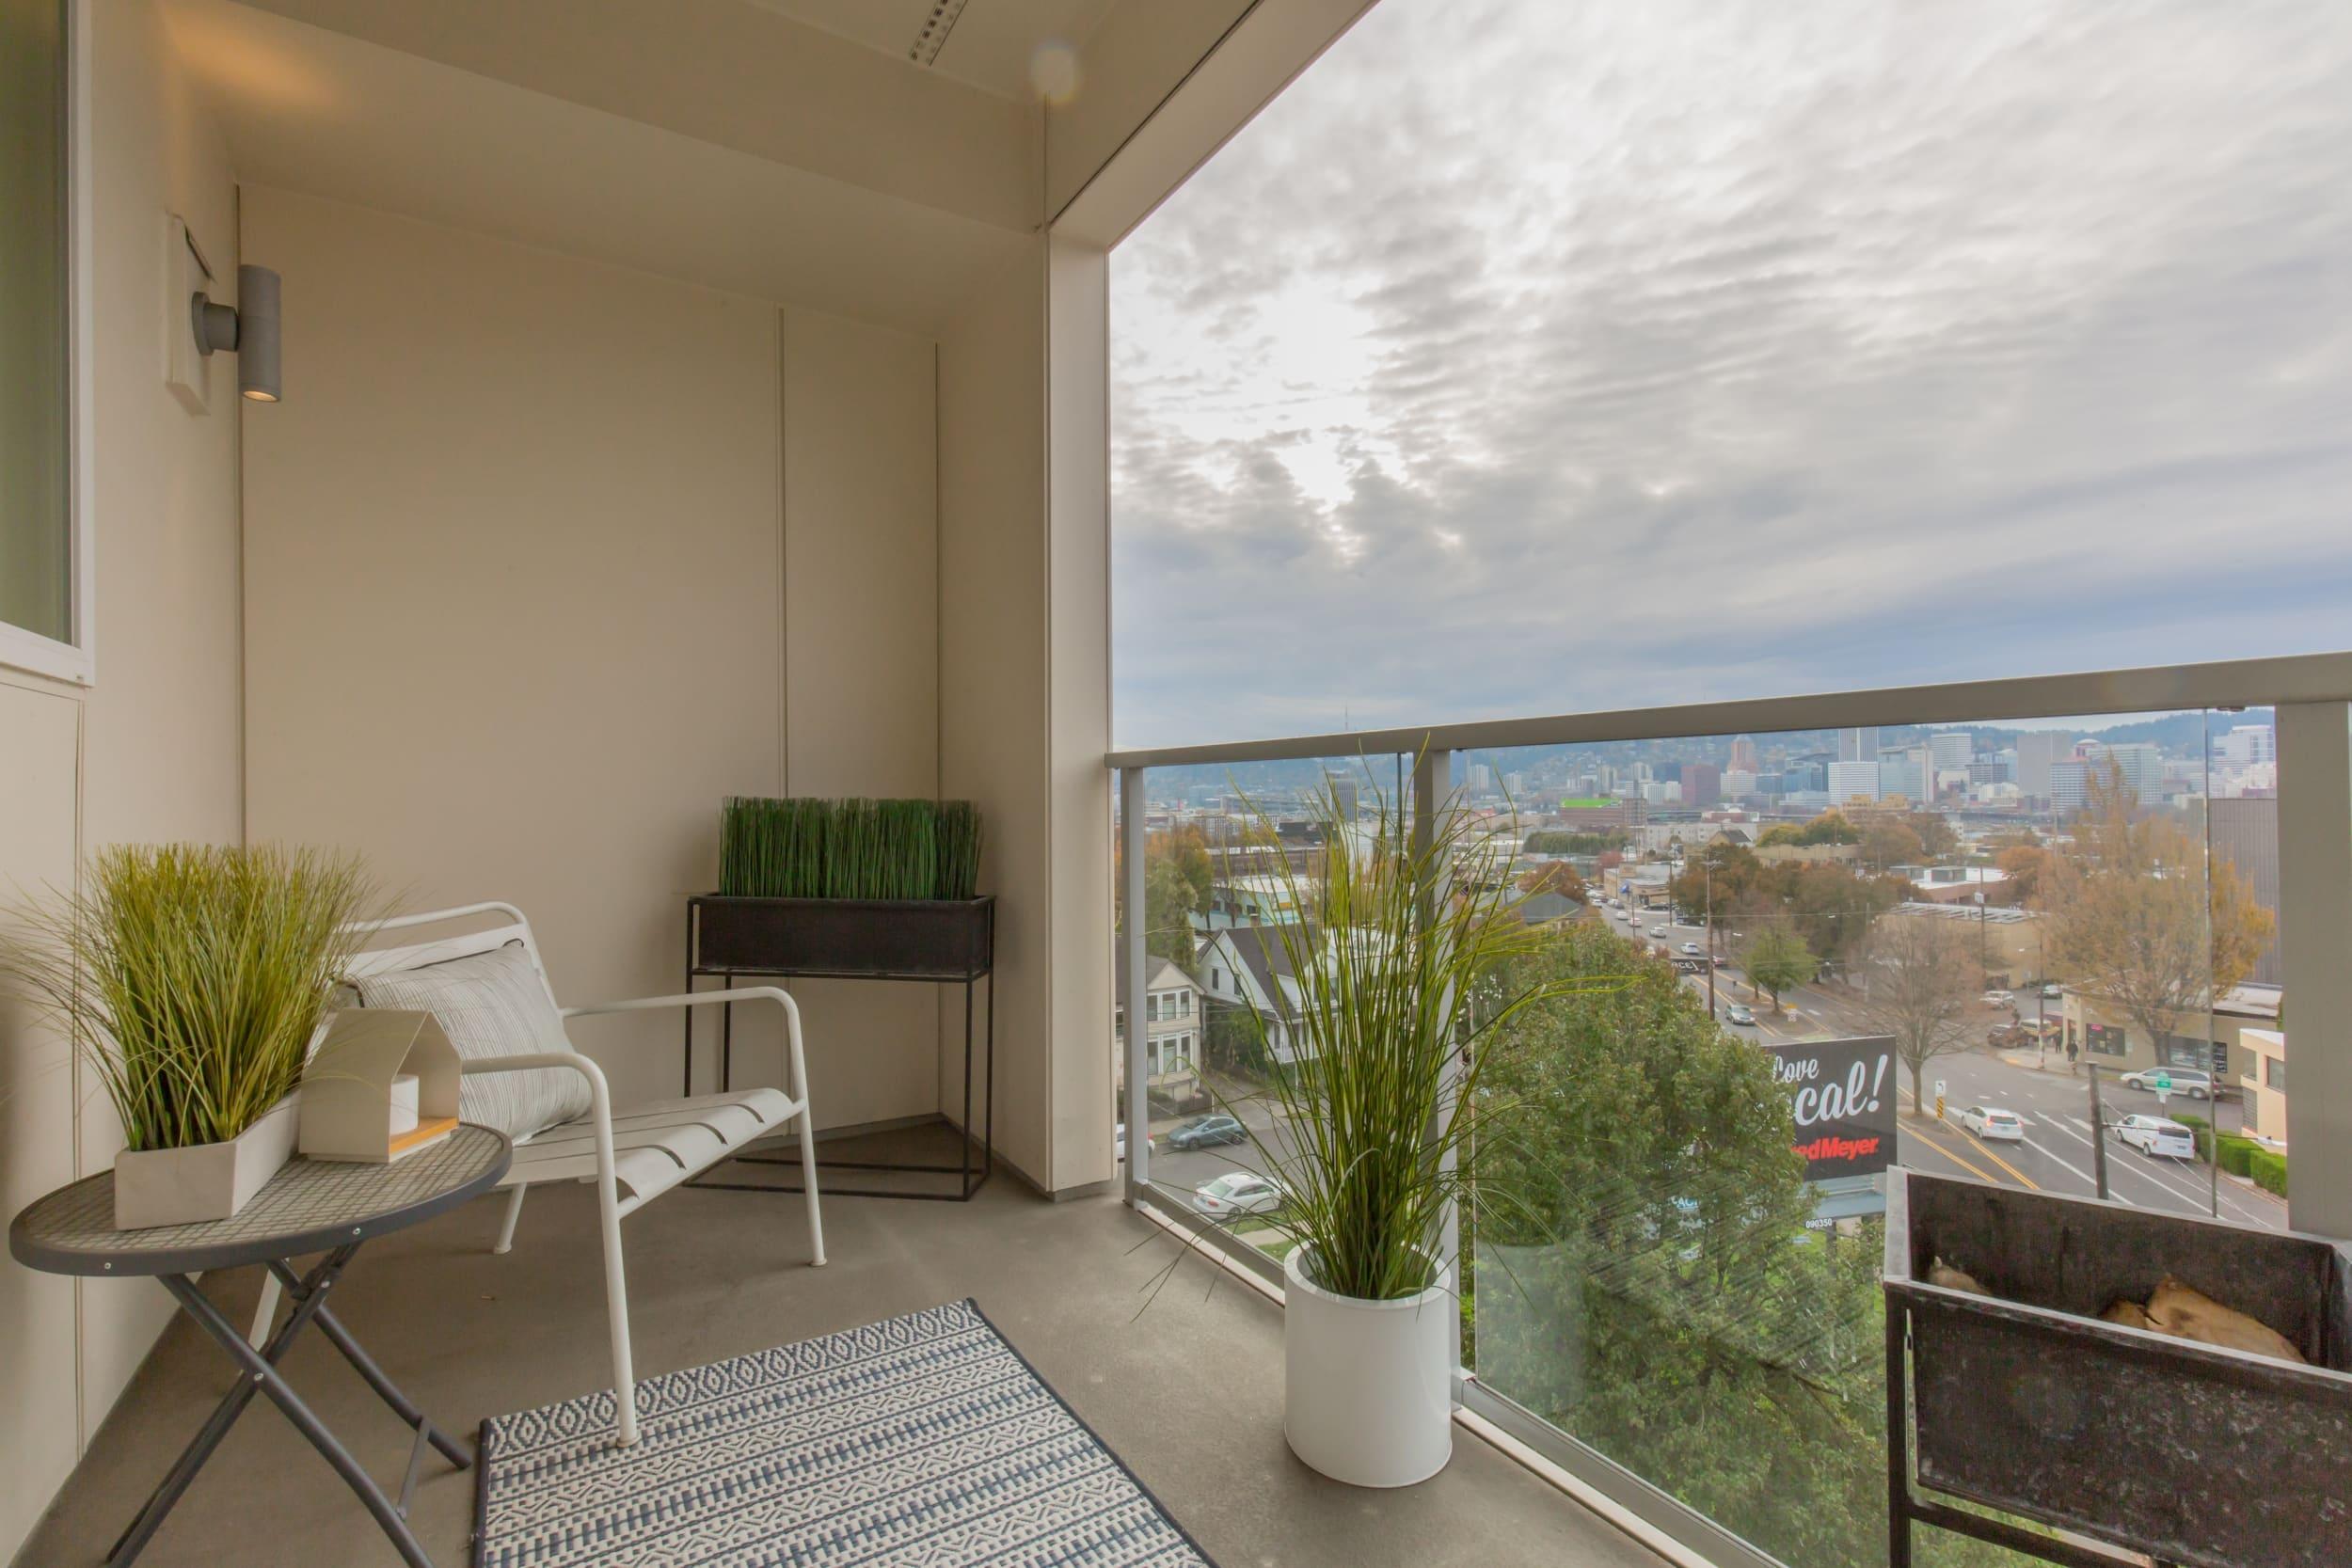 Expansive Balconies with Portland Skyline Views